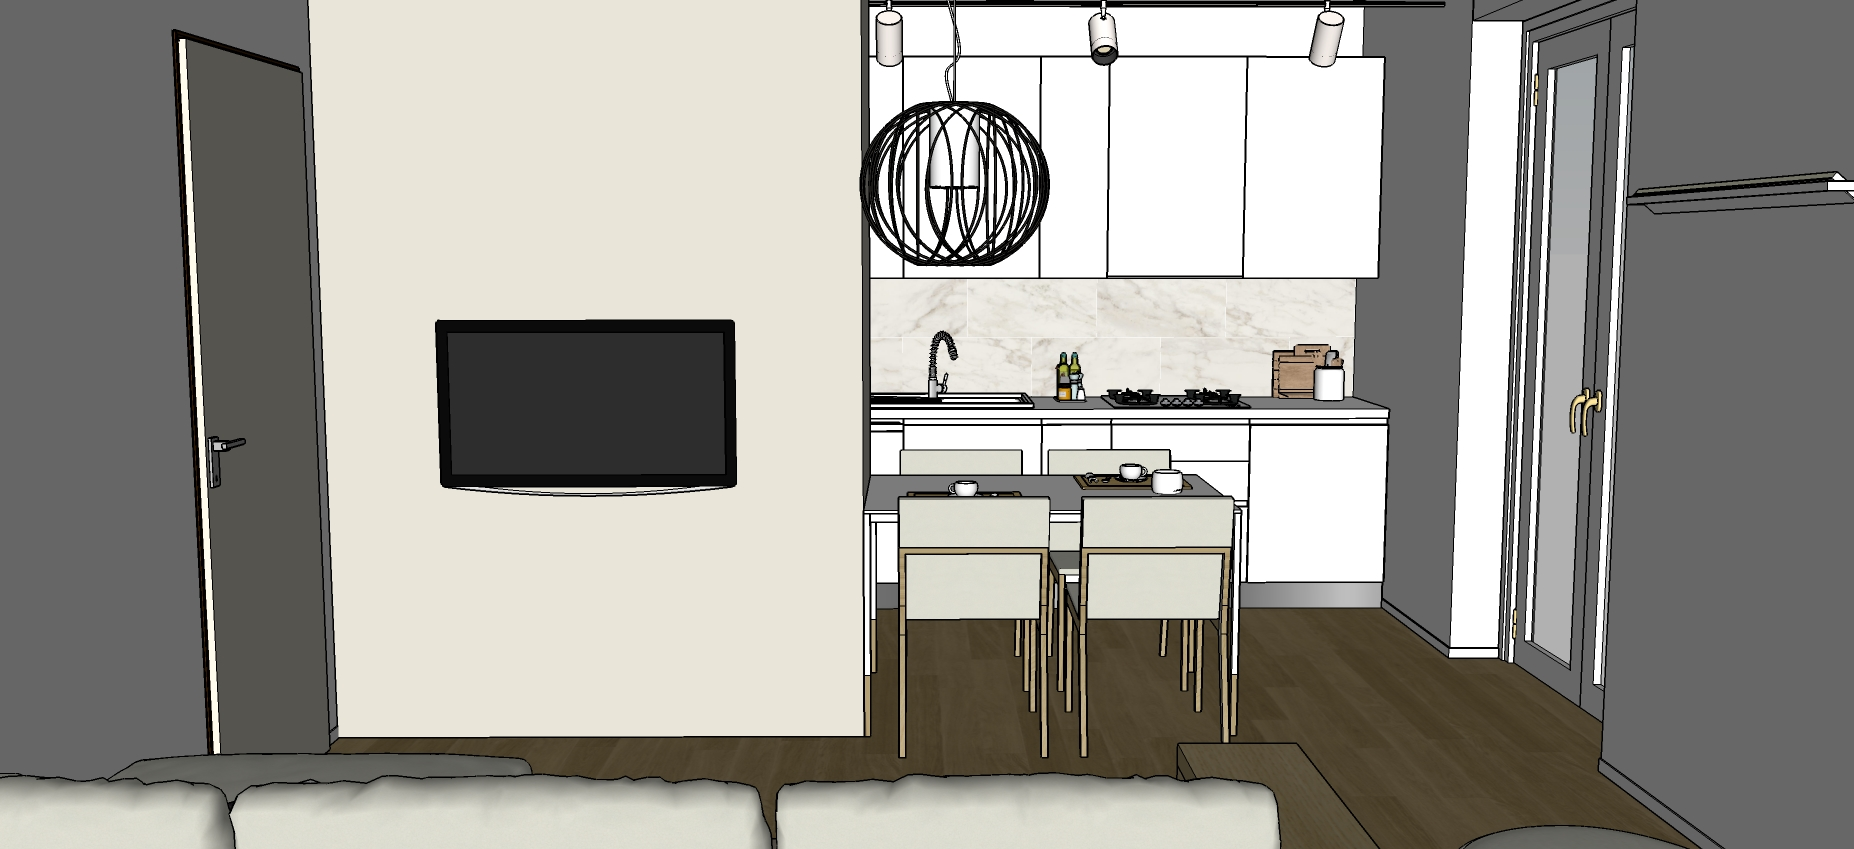 Apertura Nel Muro Tra Cucina E Sala Da Pranzo - The Homey ...